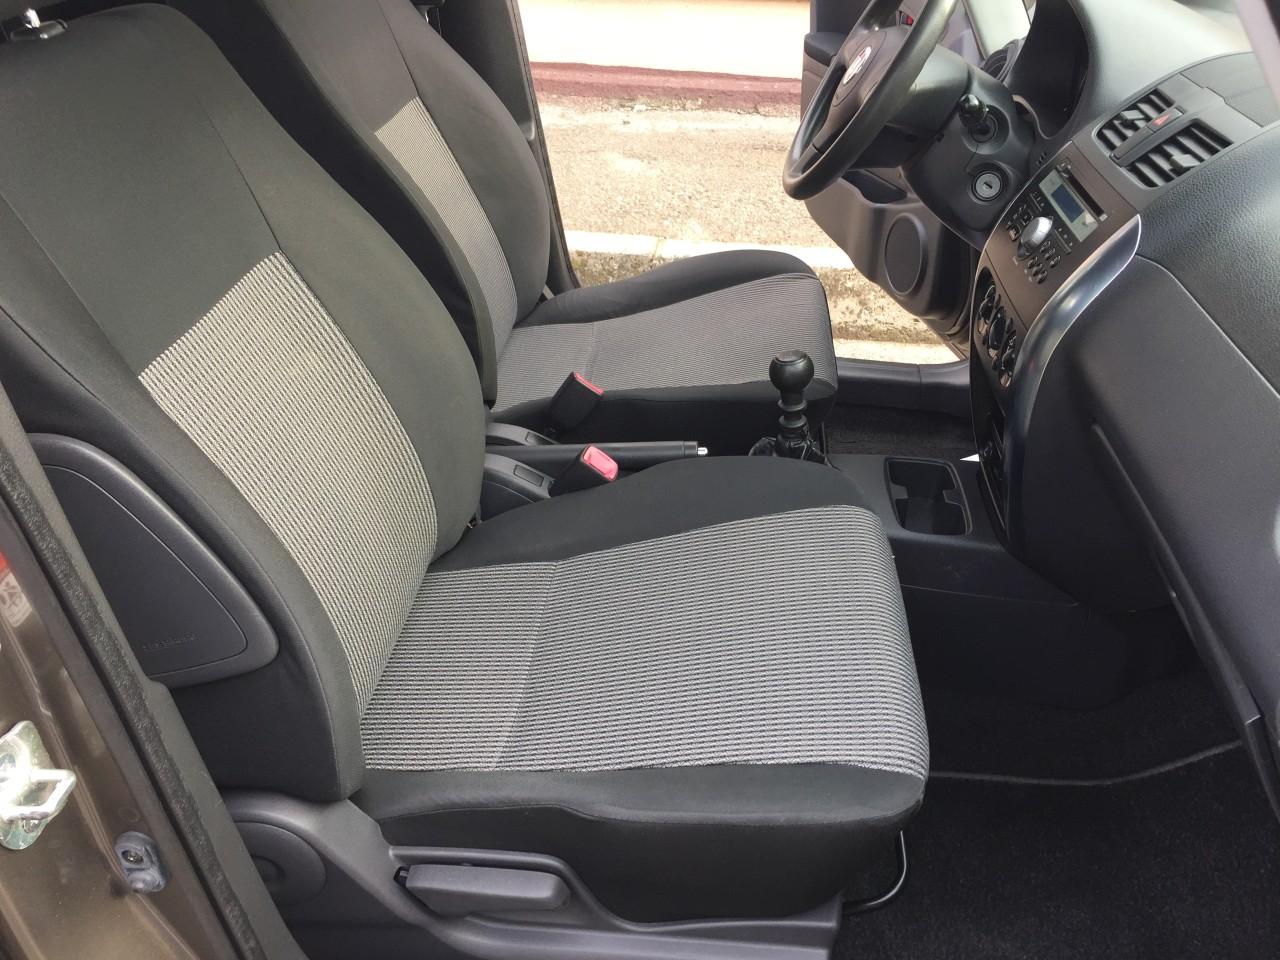 Fiat Sedici 4x4 cuplaj din buton EURO 5 2011